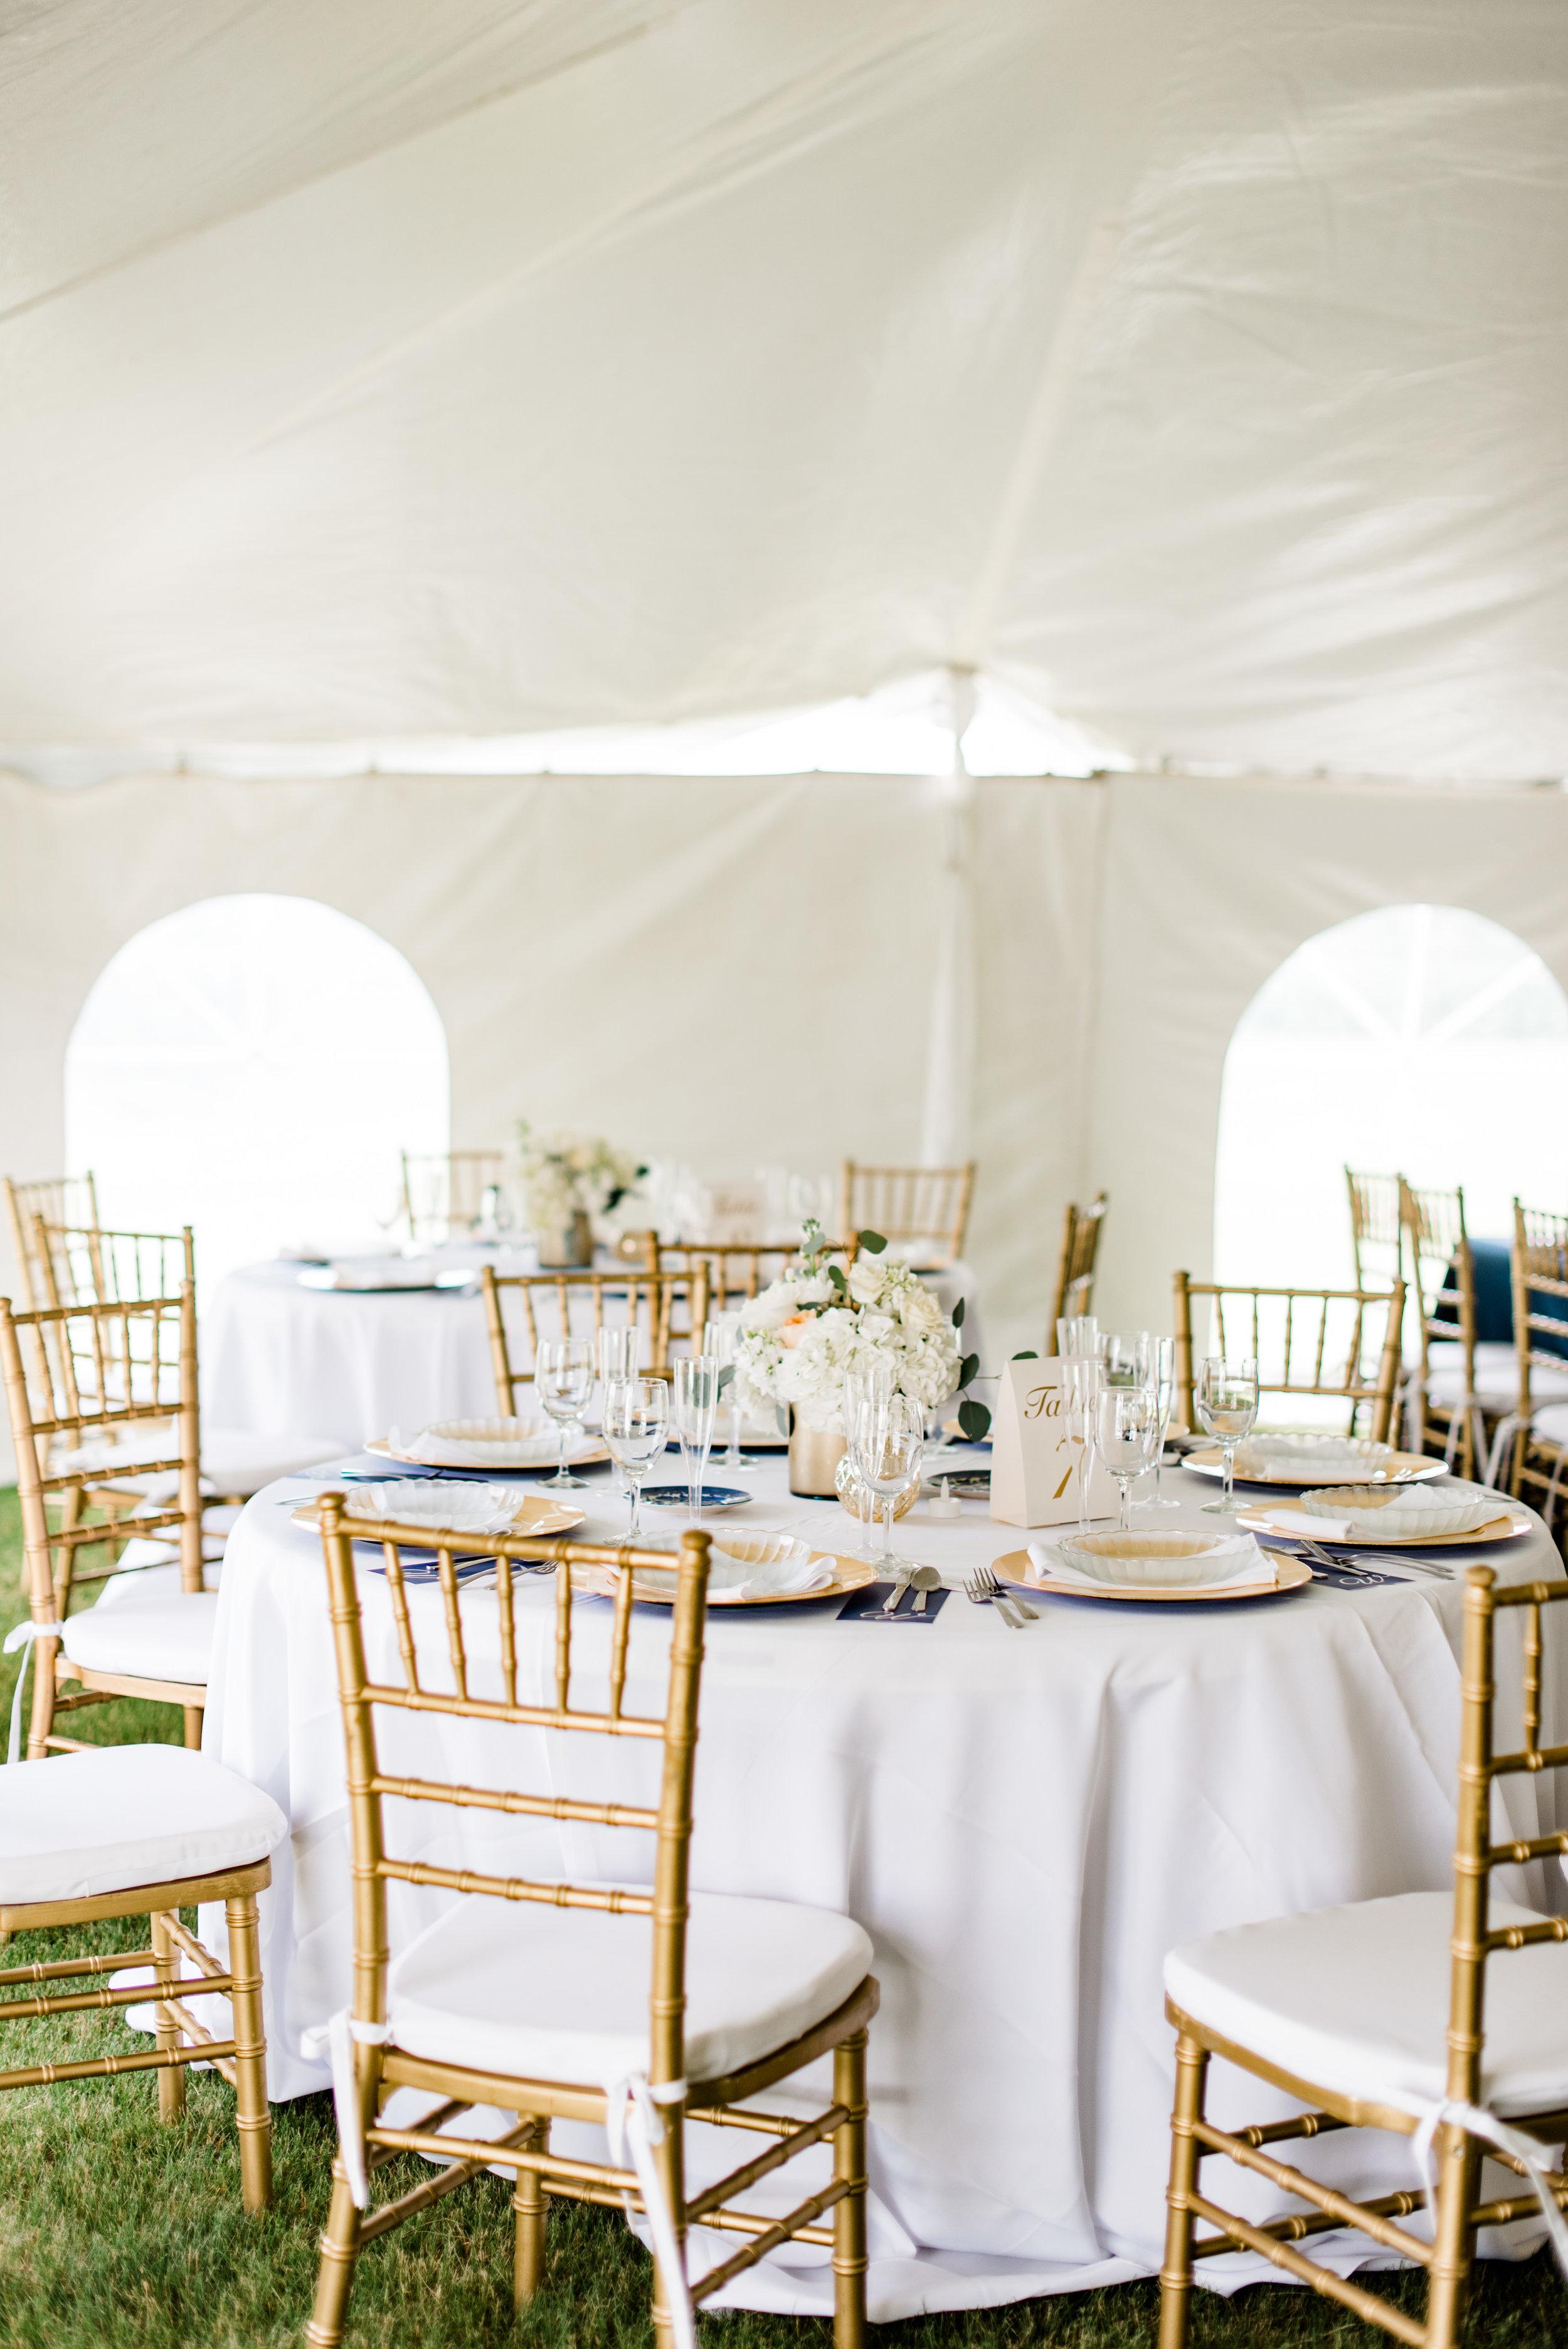 Anthony-and-stork-Weddings-286.jpg